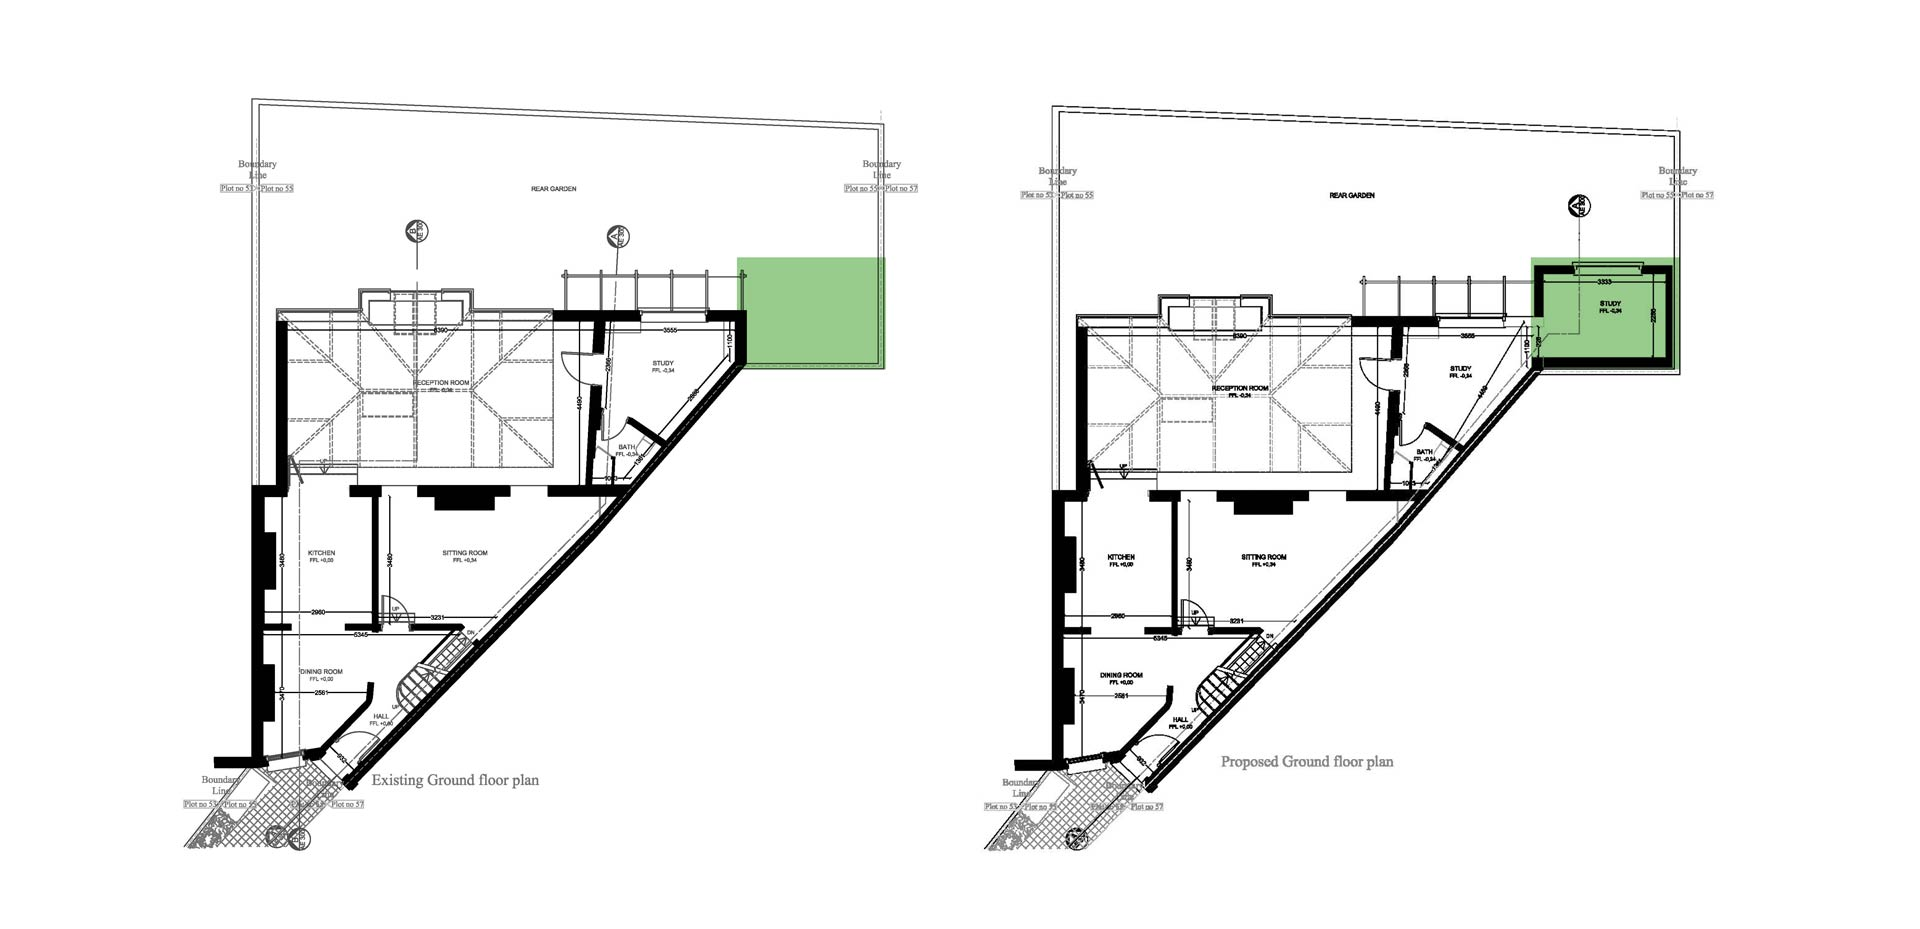 Hammersmith-&-Fulham-council-Ground-Floor